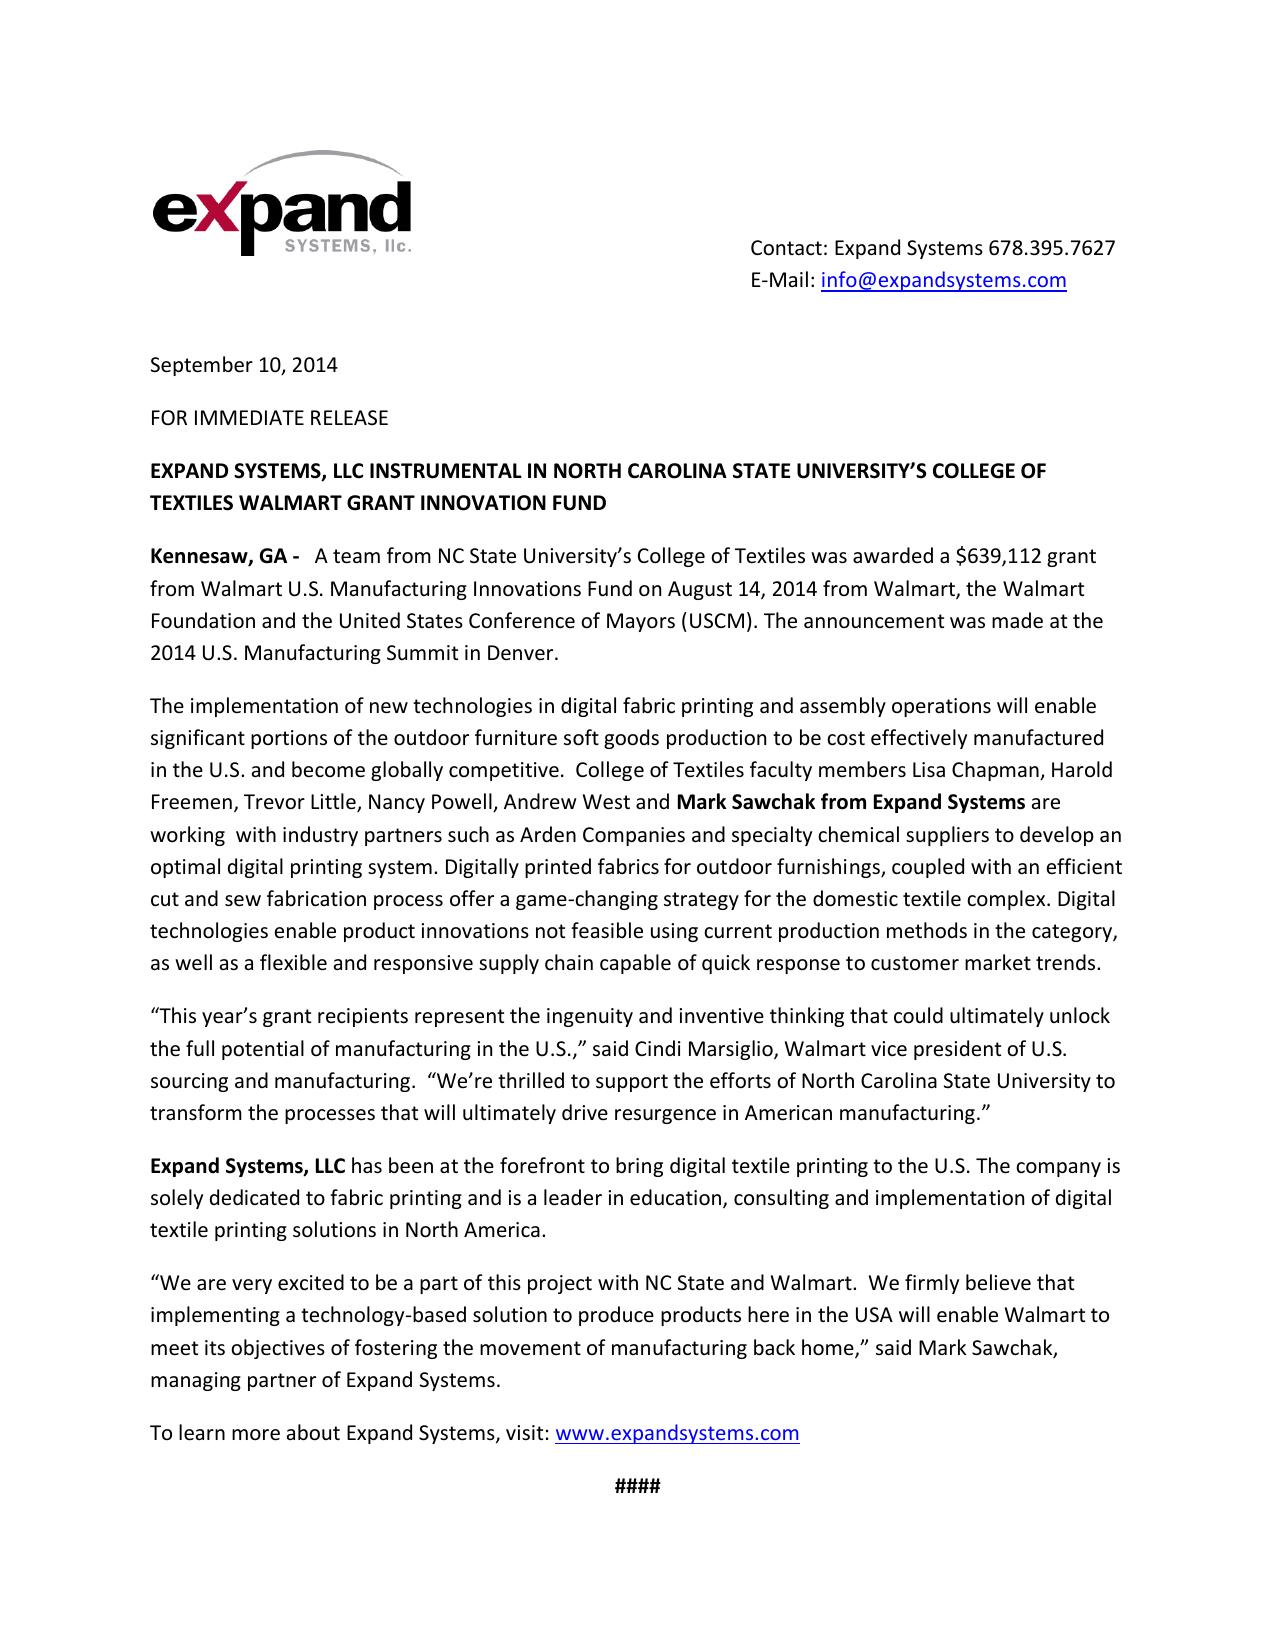 Contact: Expand Systems 678 395 7627 E